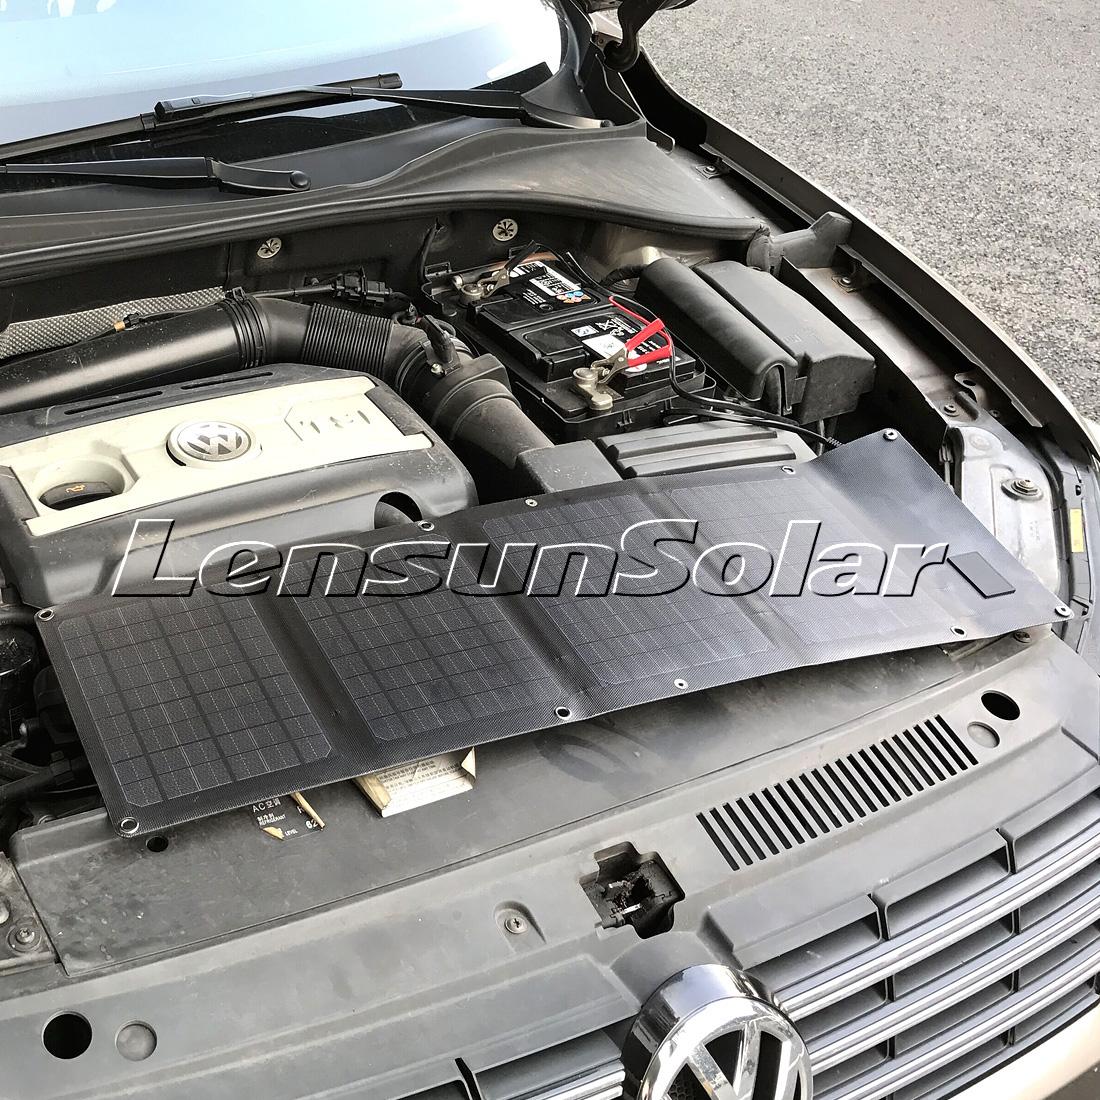 Lensun 20w 12v Folding Flexible Solar Charger For Mobile Phone Laptop And Car Battery Best Thinnest Panel